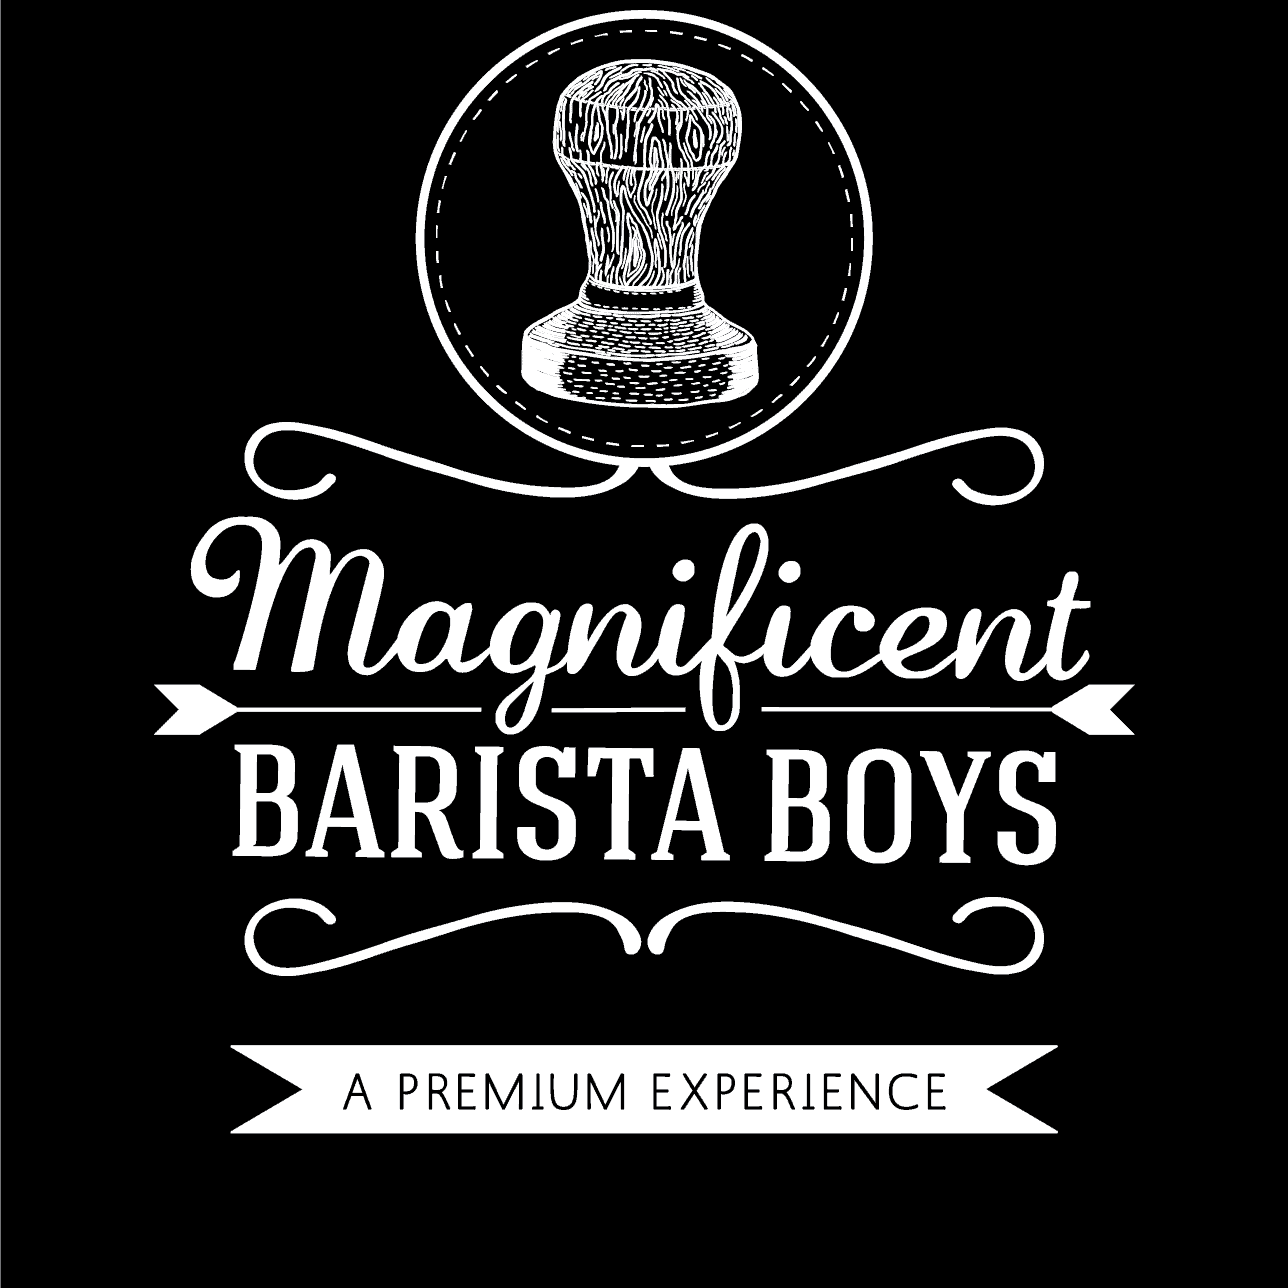 Magnificent Barista Boys